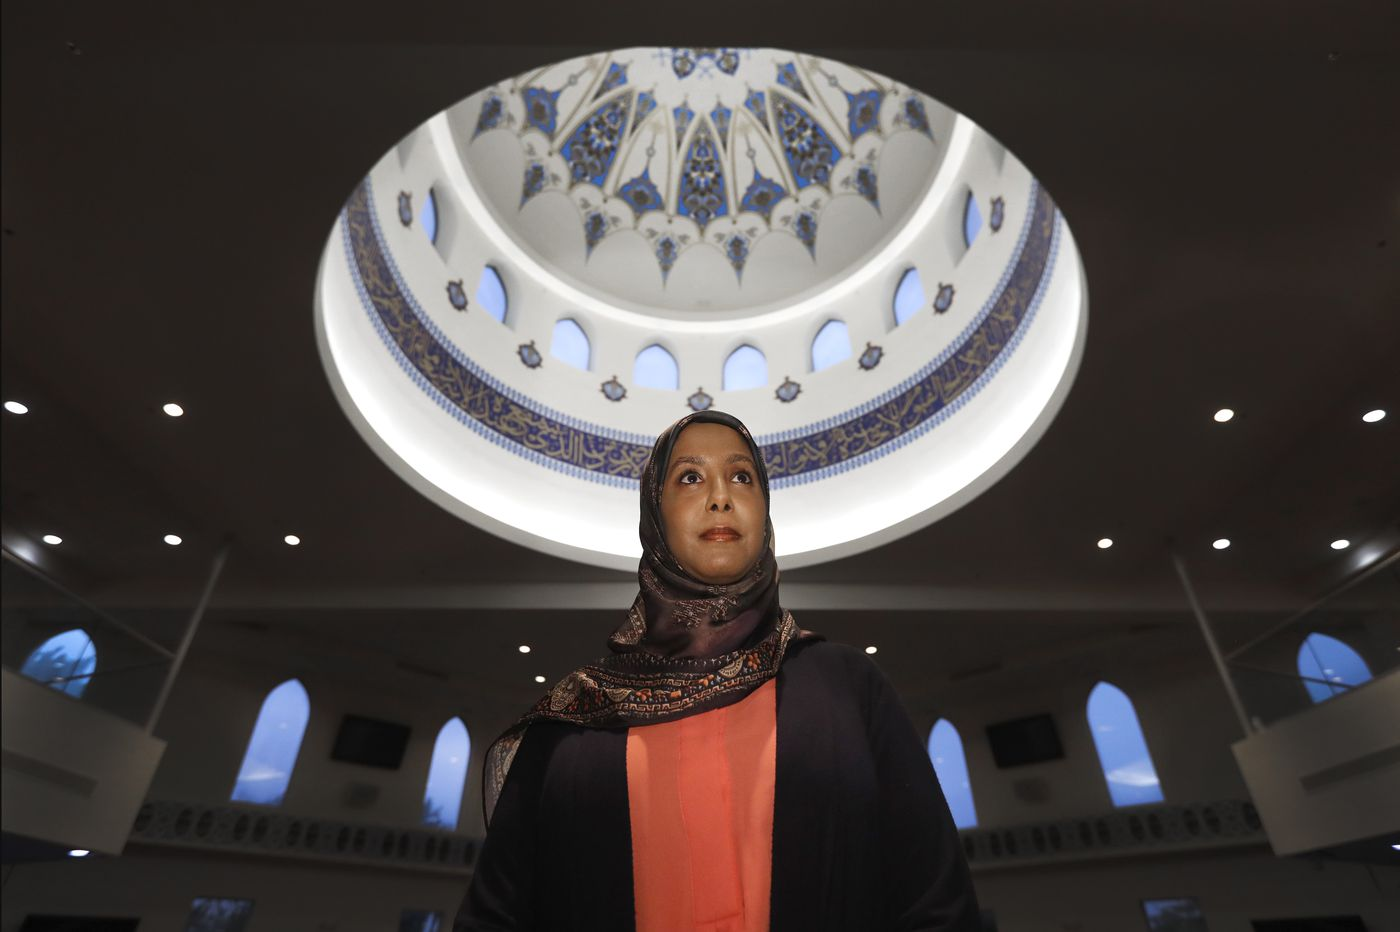 Amid nationwide protests, raw talk and racial reckoning among U.S. Muslims